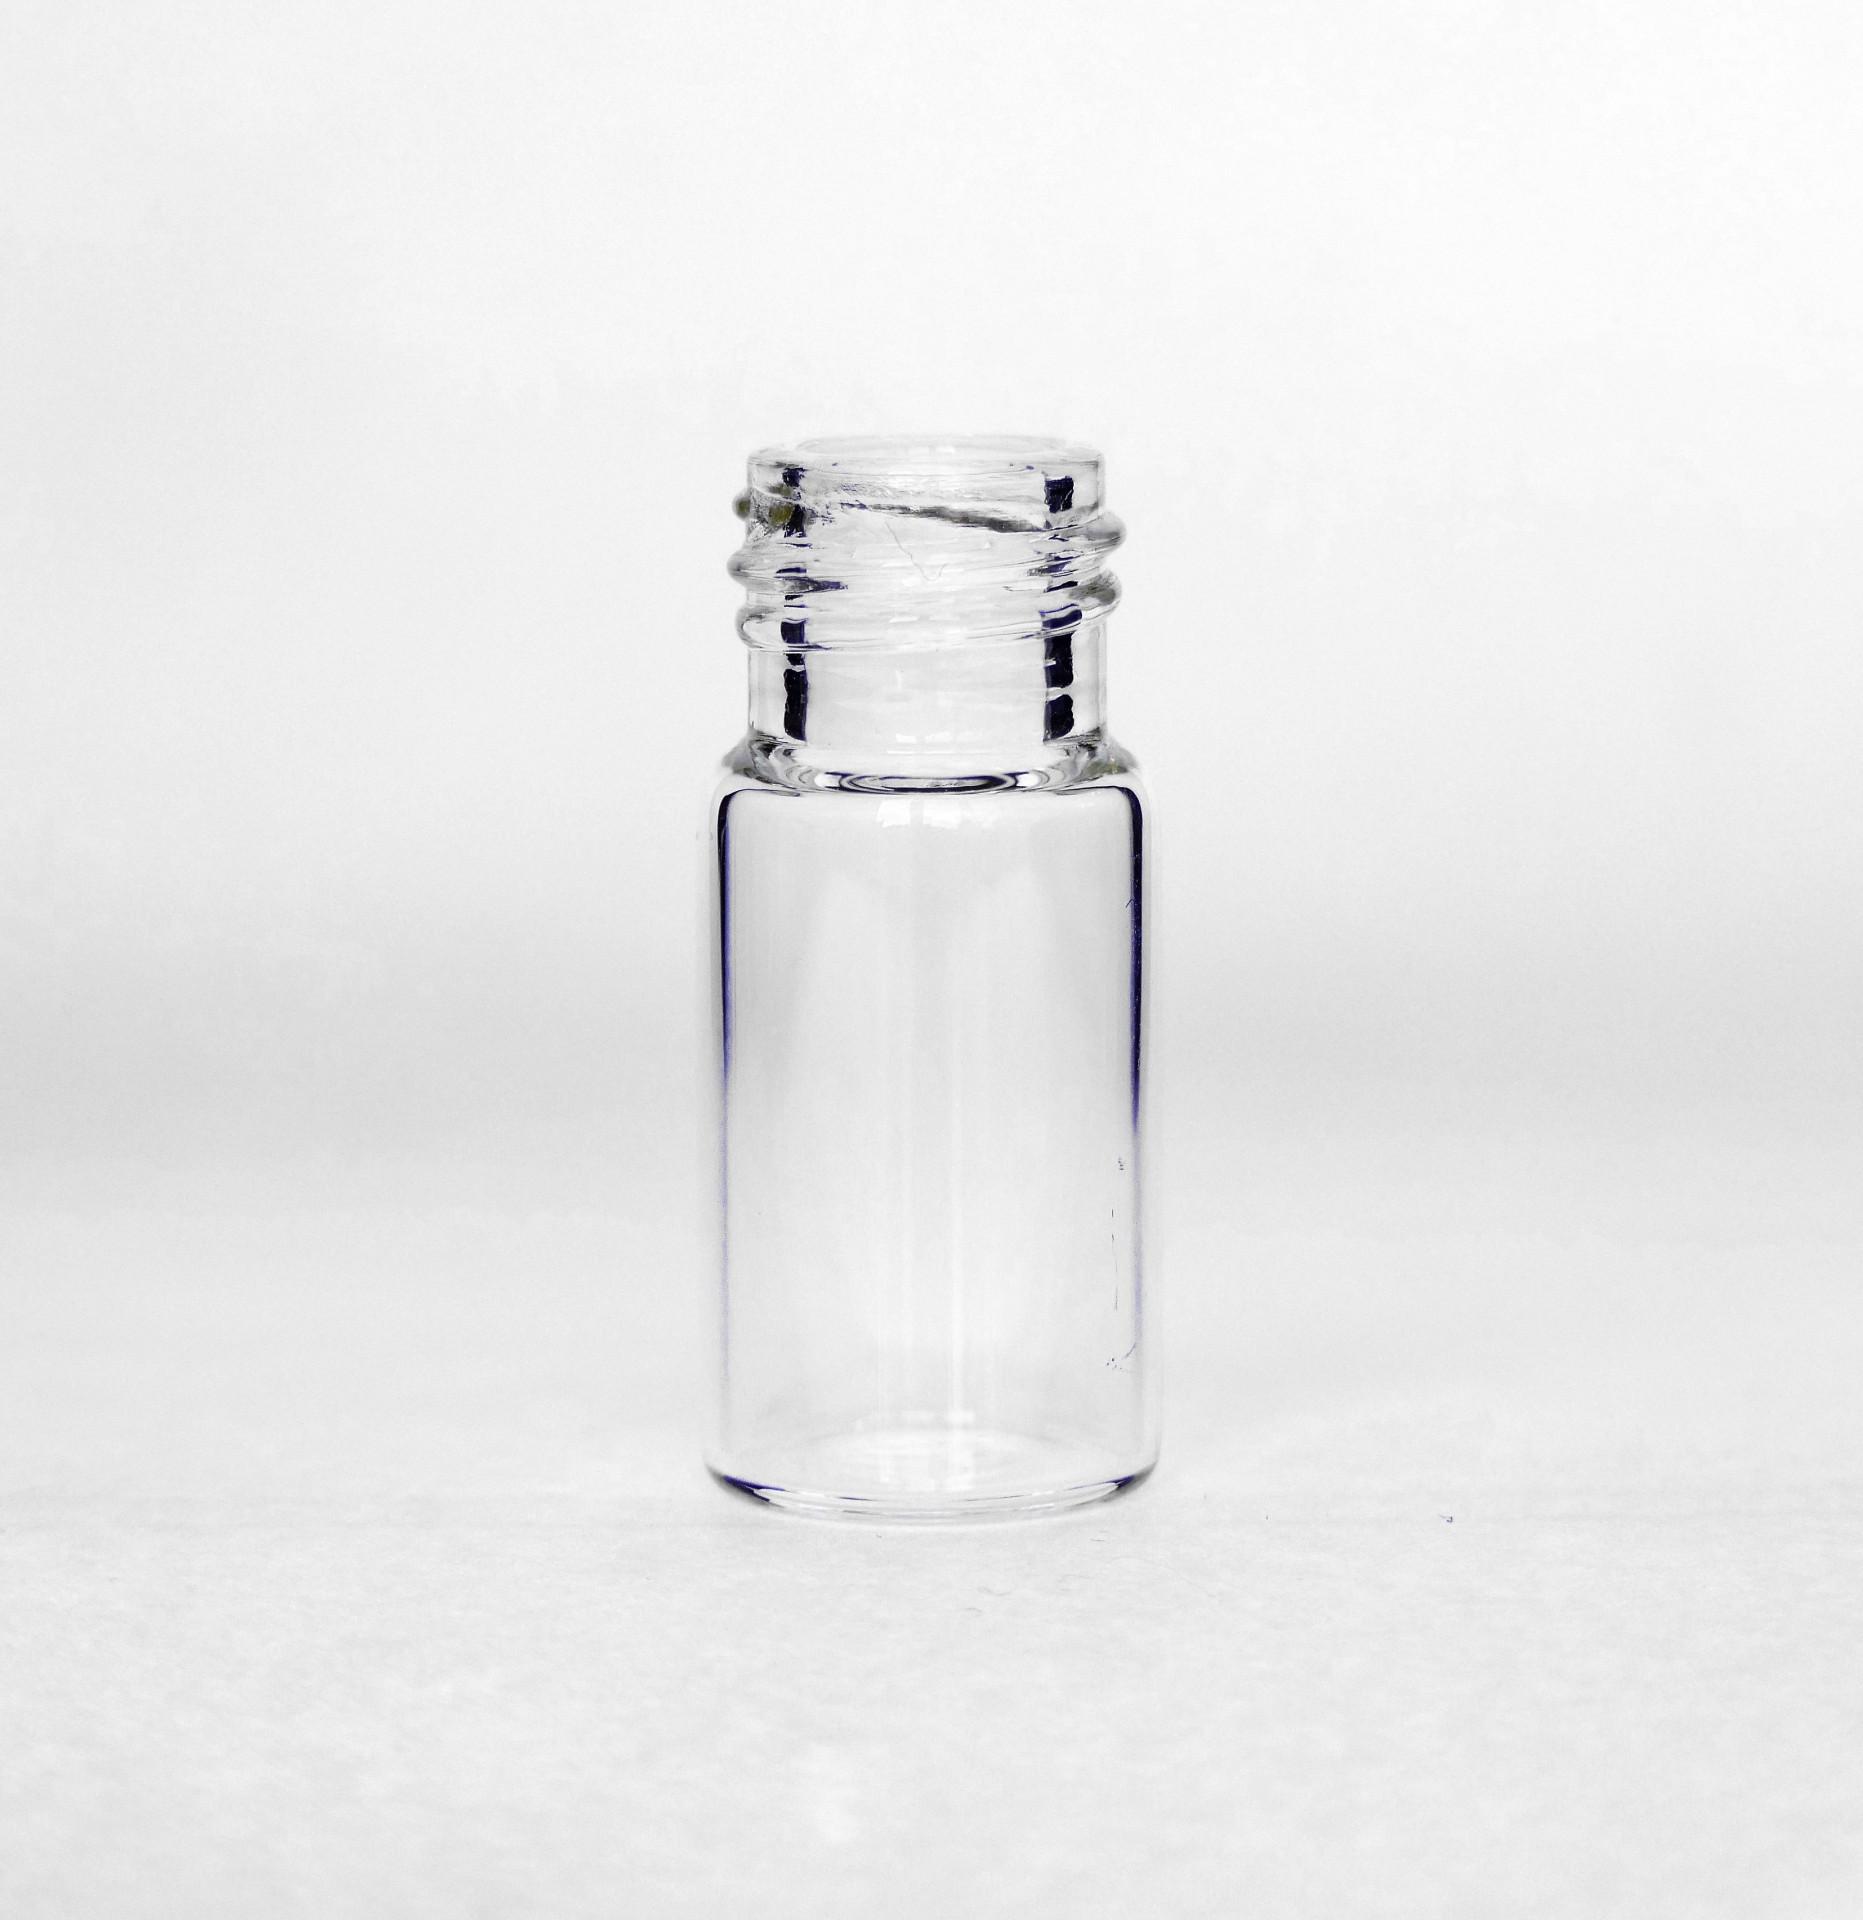 3ml Dropper Vial Clear 3ml VI-0301-C4